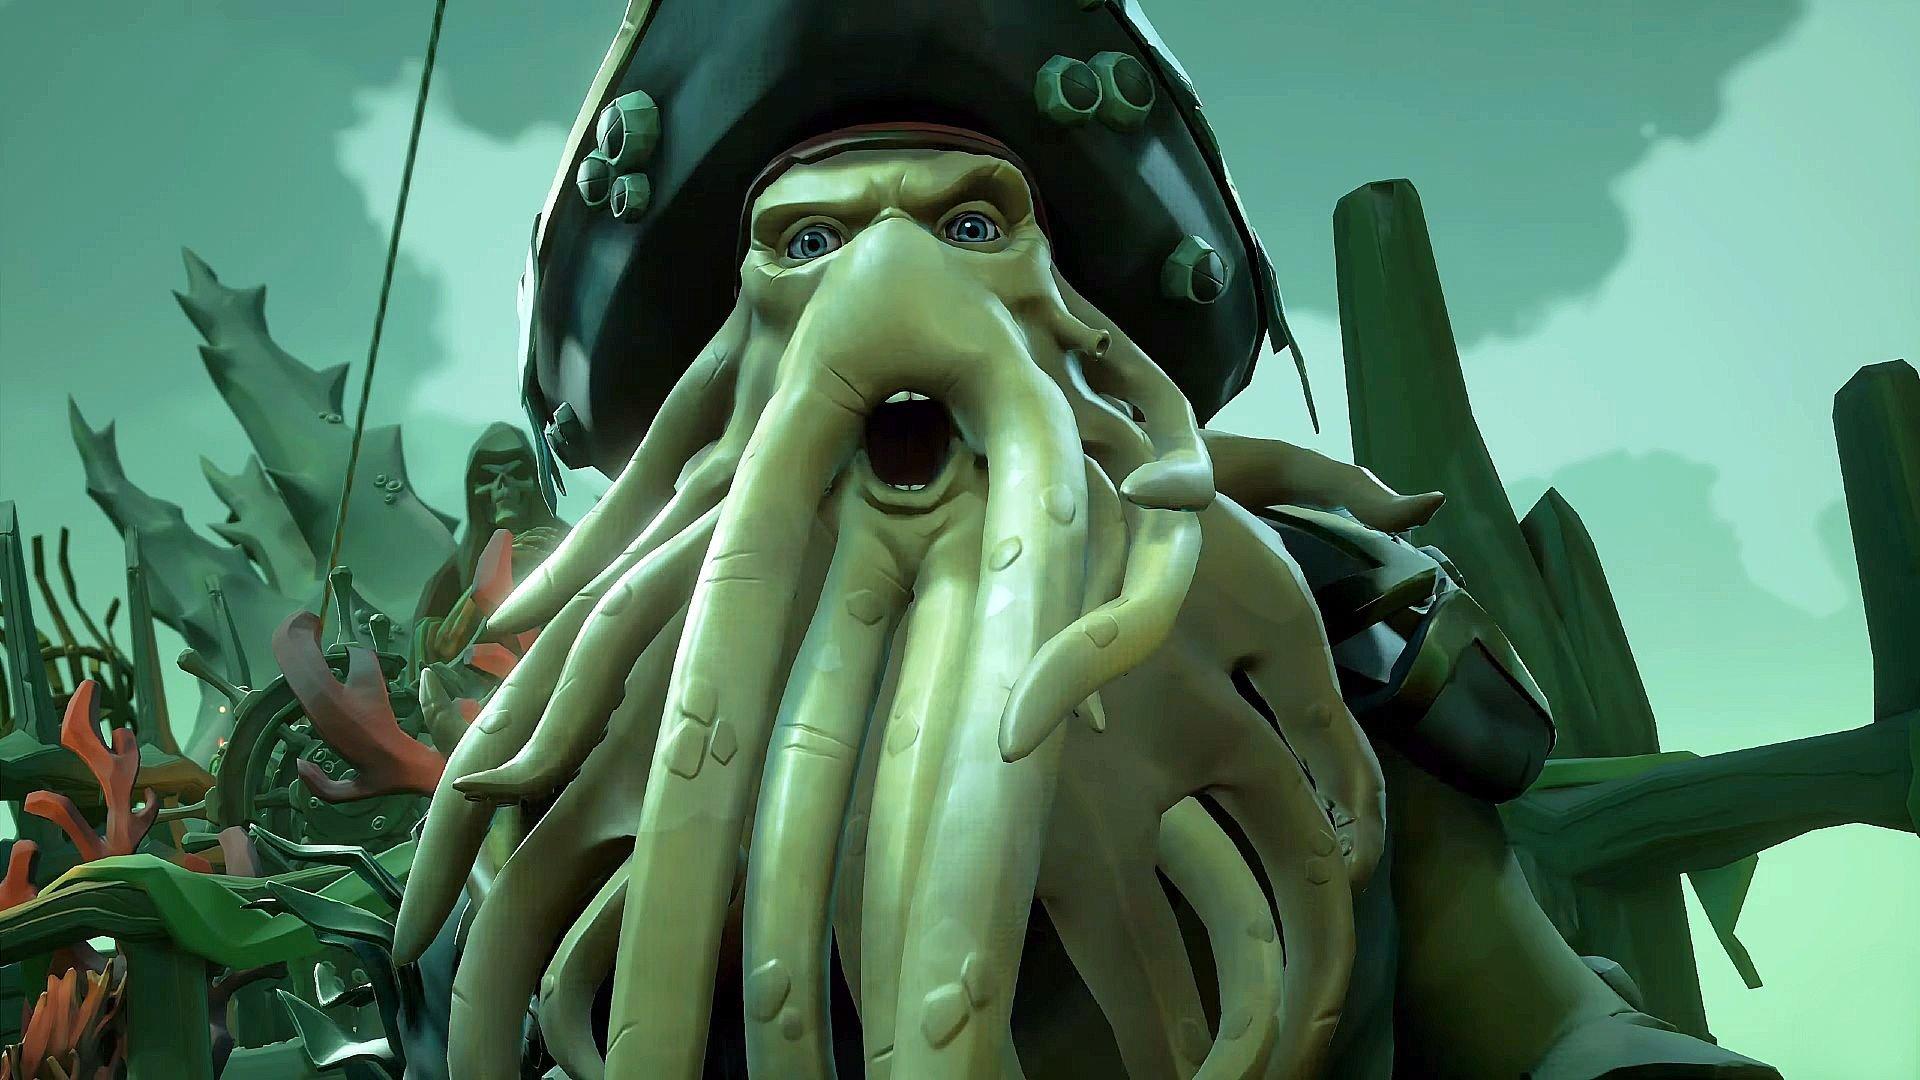 Se gameplay från Sea of Thieves med Jack Sparrow